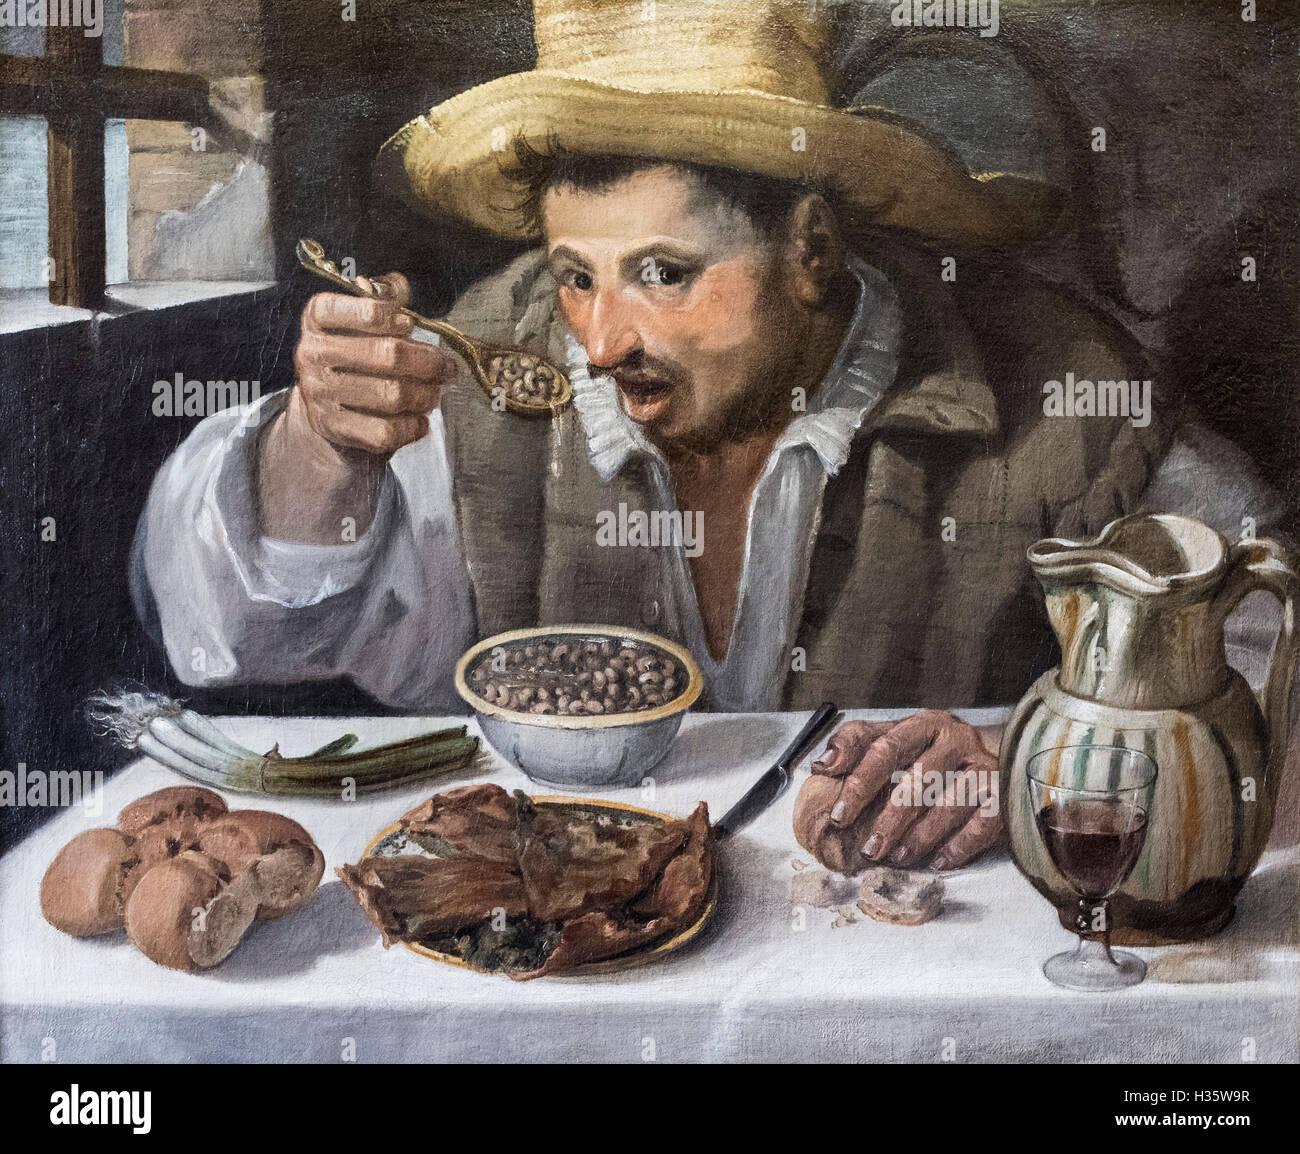 Annibale Carracci (1560-1609), The Bean Eater (Il Mangiafagioli), 1580-1590. - Stock Image